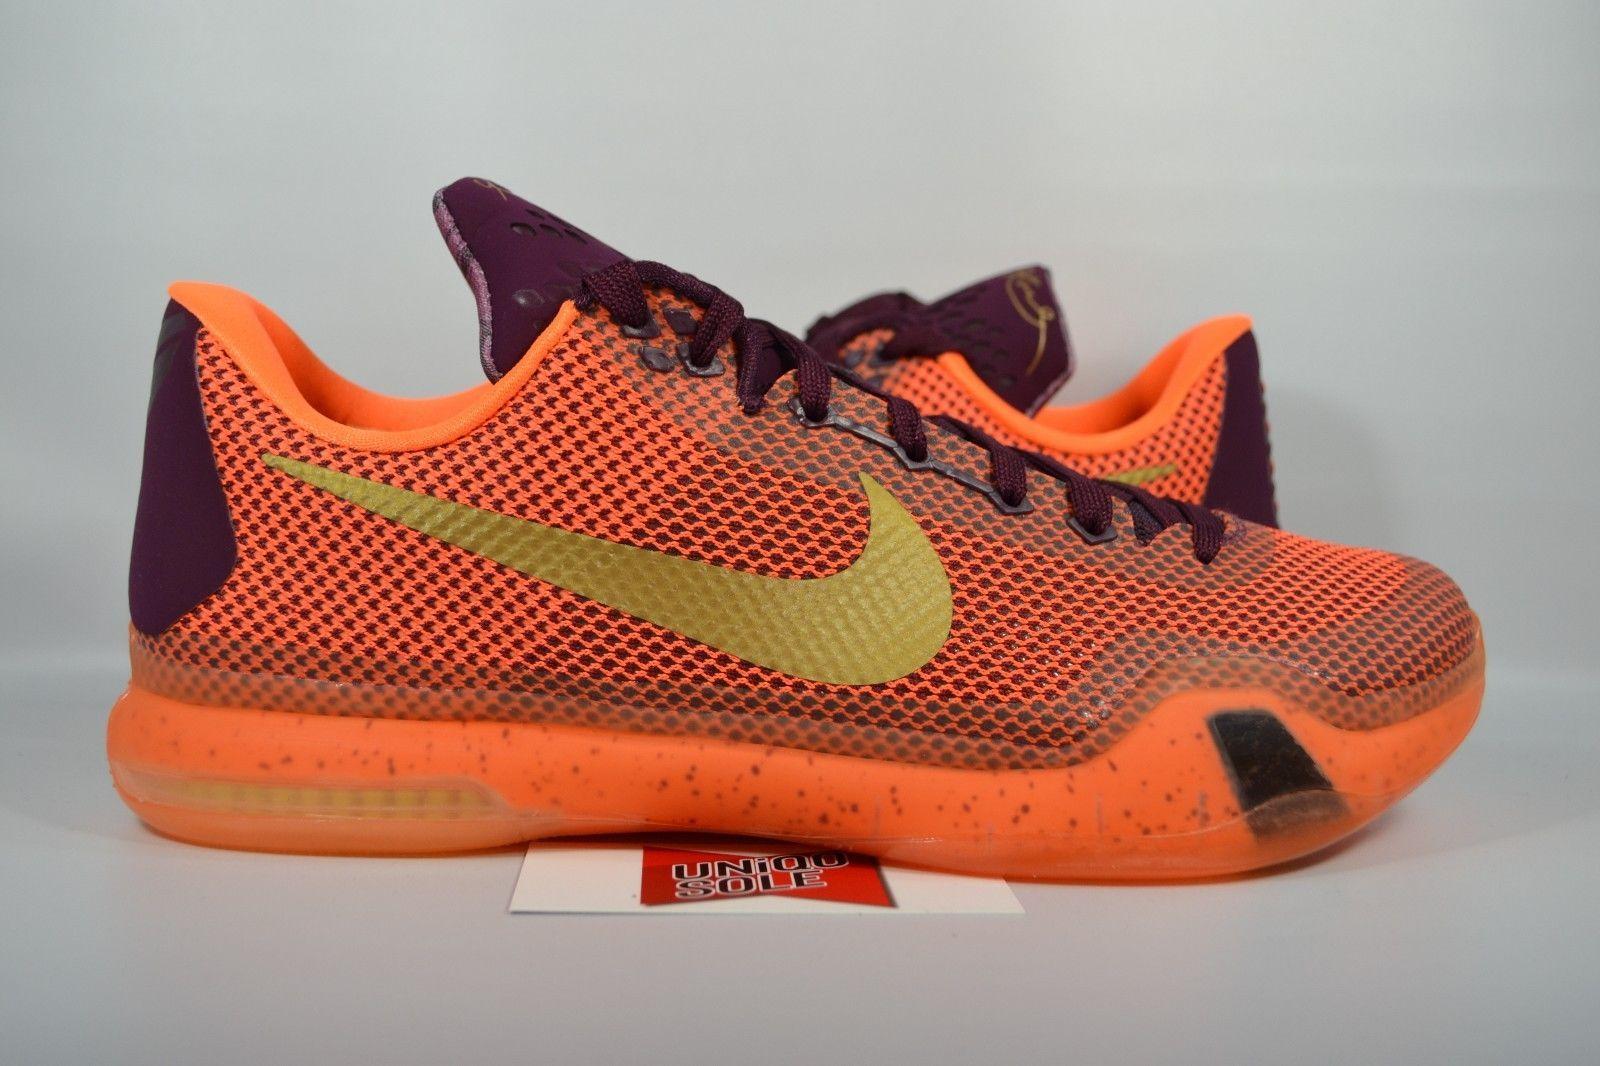 bb60beb3533b NEW Nike Kobe X 10 SILK ROAD MERLOT METALLIC TOTAL ORANGE 705317-676 sz 8.5